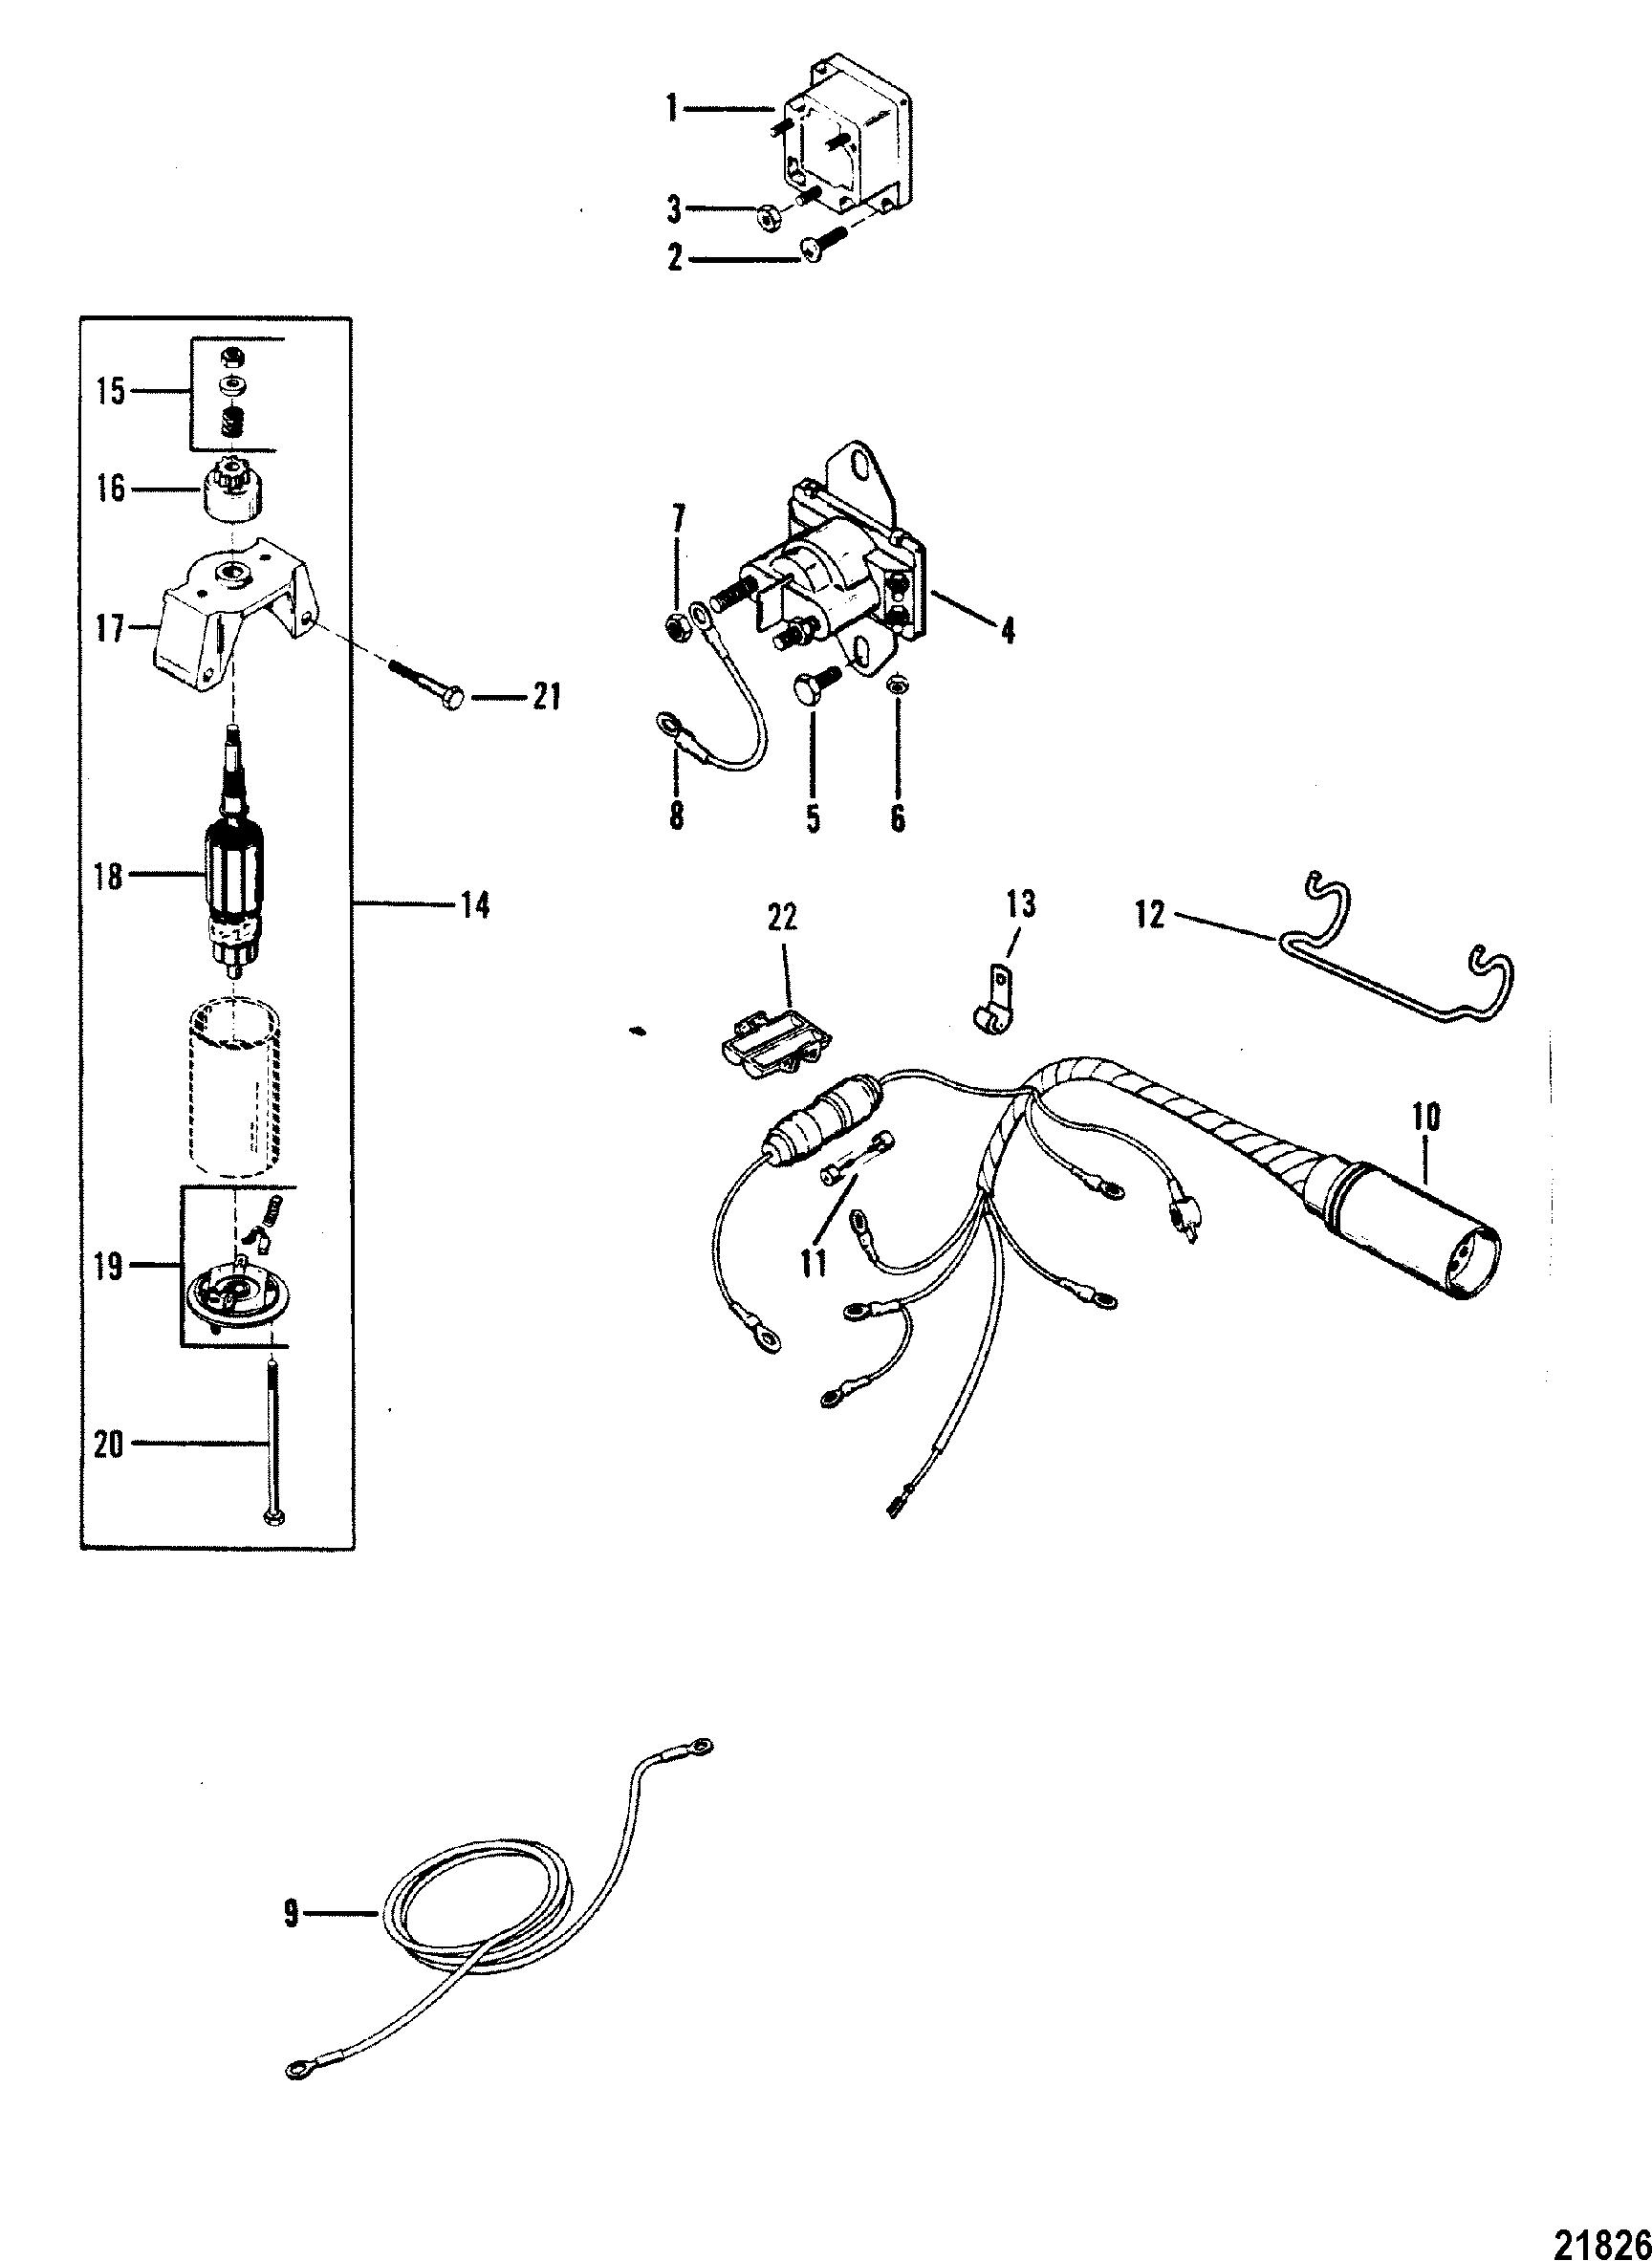 Sea Pro Wiring Diagram Auto Electrical Schematics